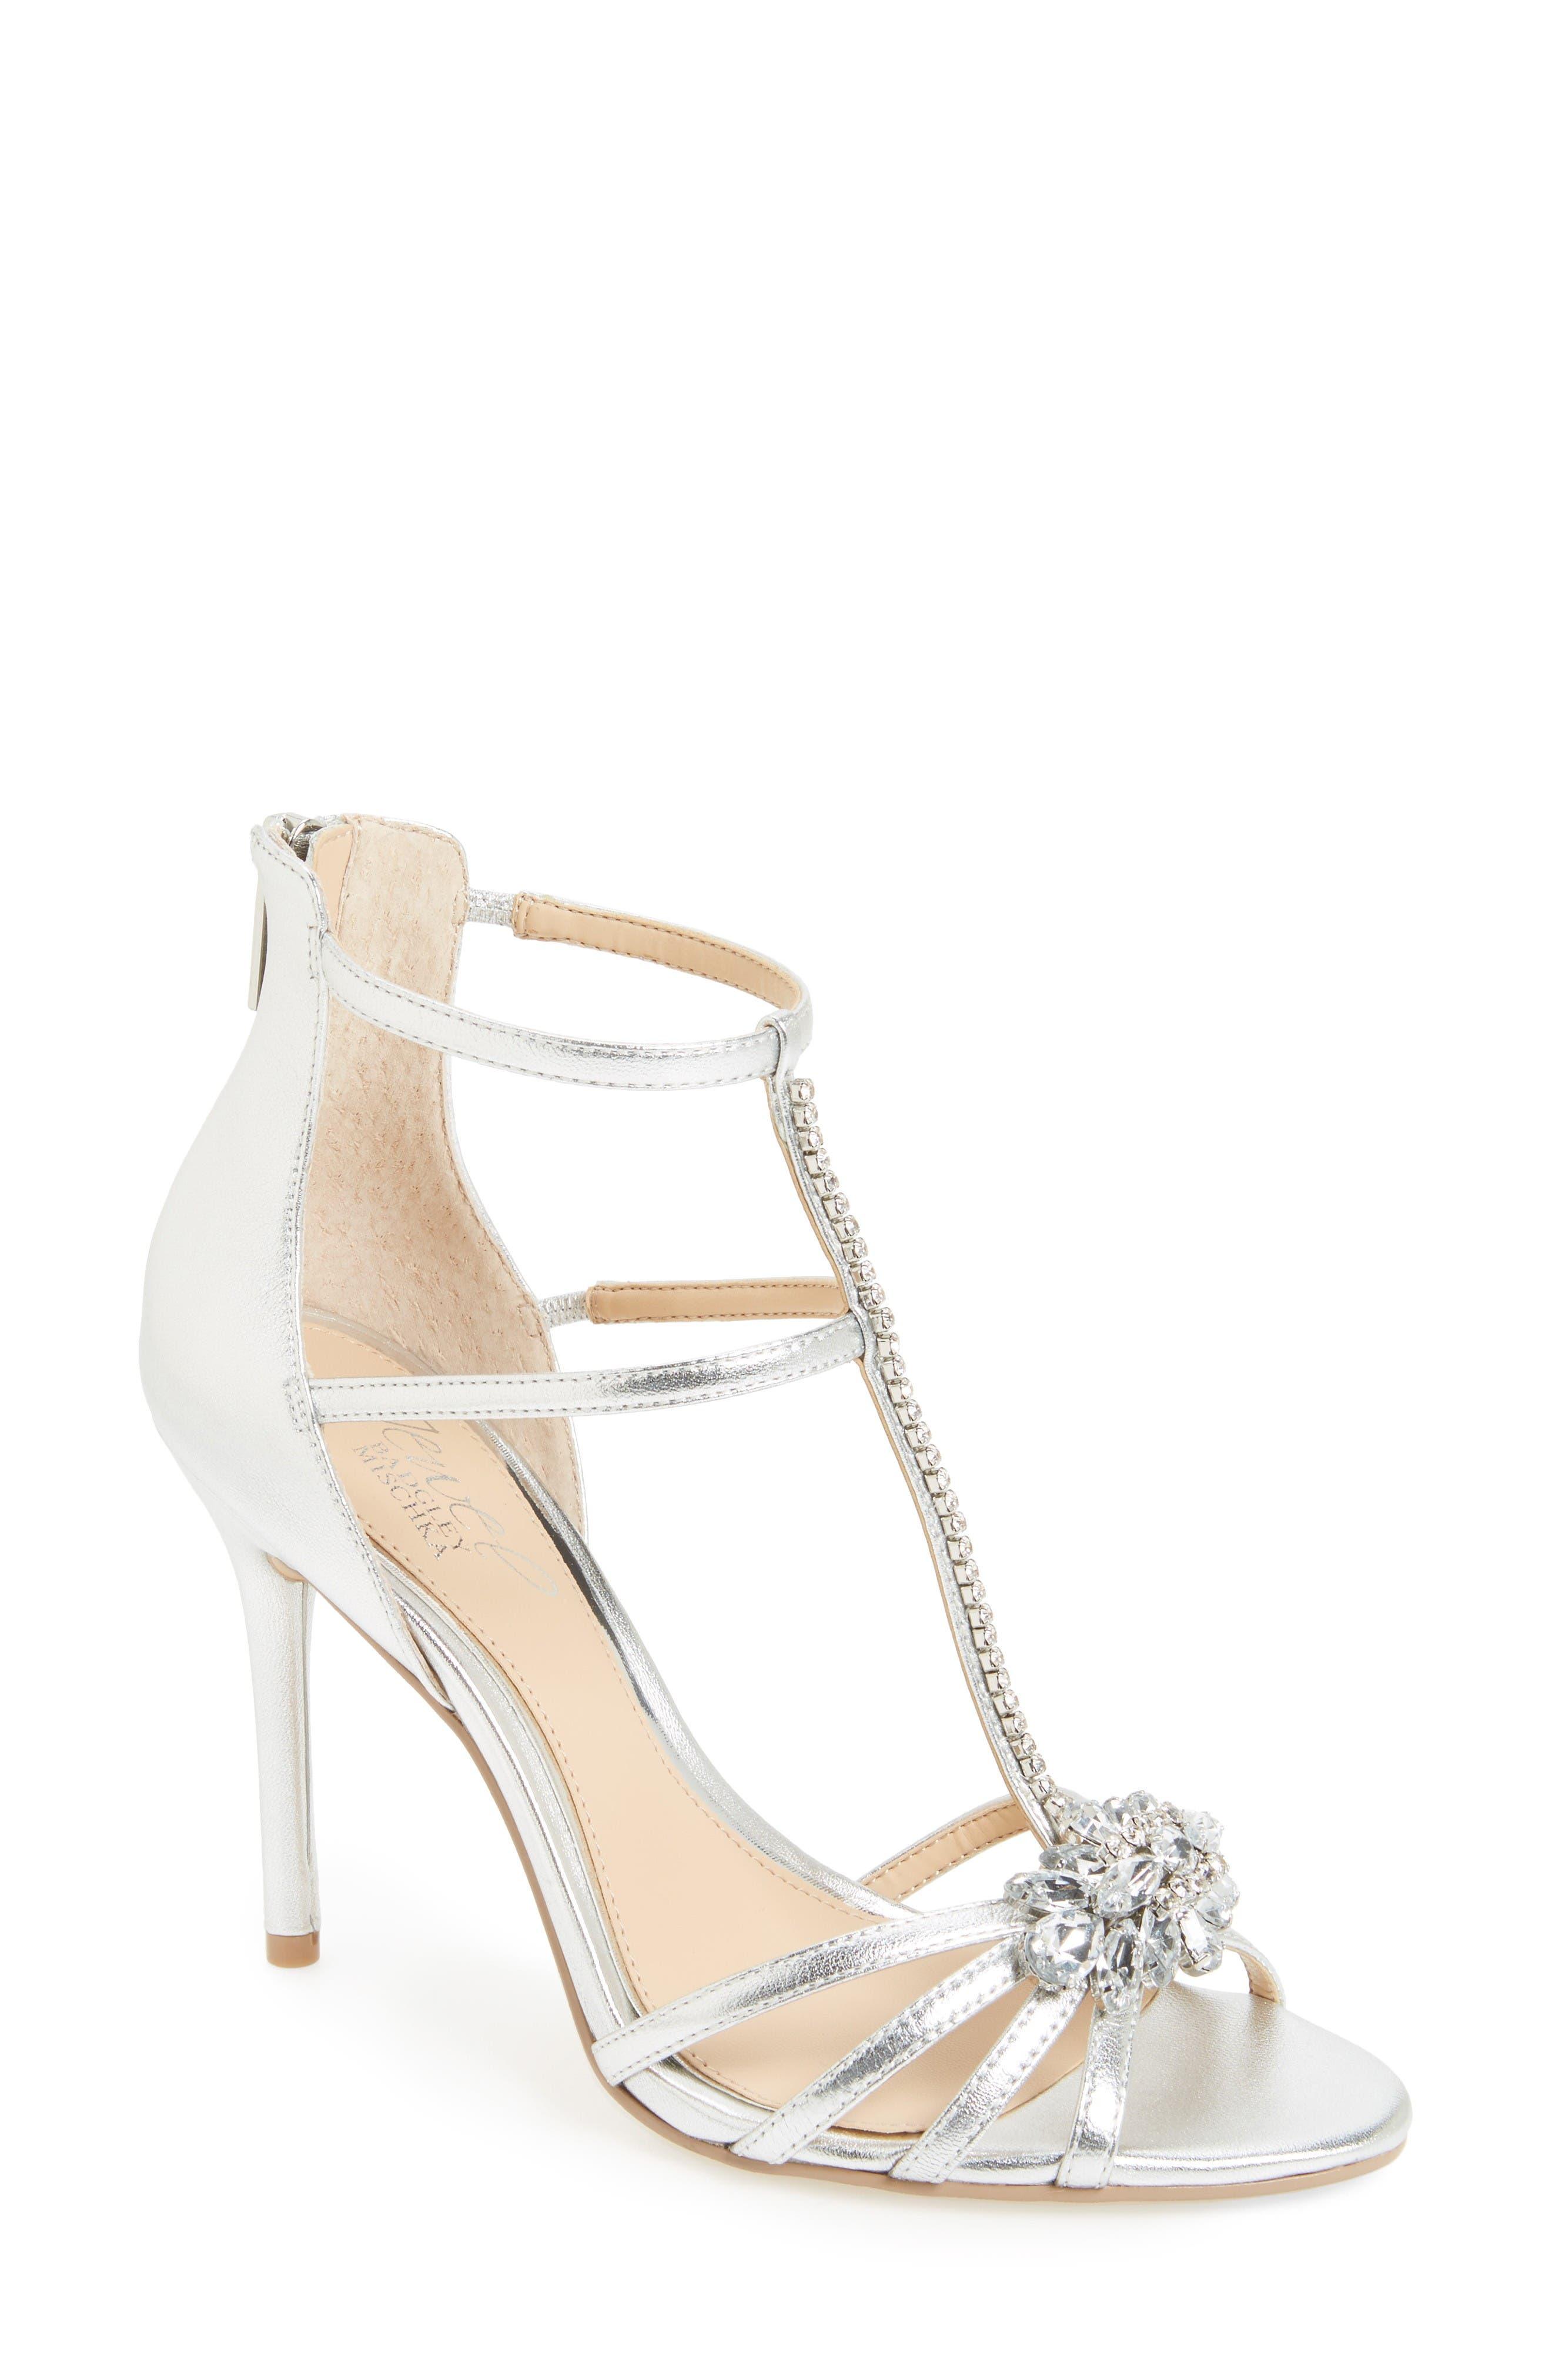 Jewel Badgley Mischka Hazel Embellished T-Strap Sandal (Women)